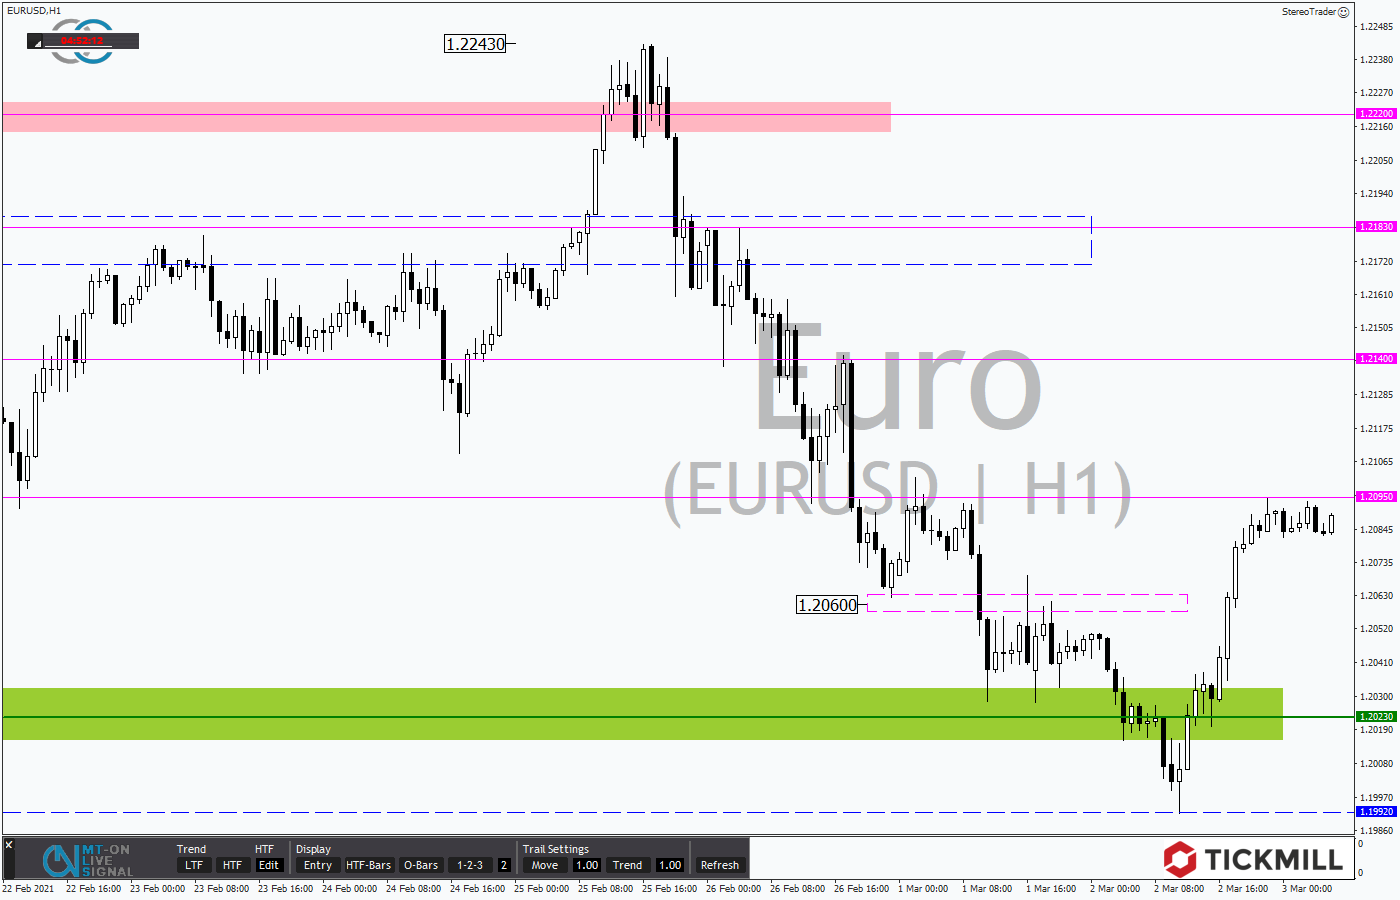 Tickmill-Analyse: EURUSD im Stundenchart